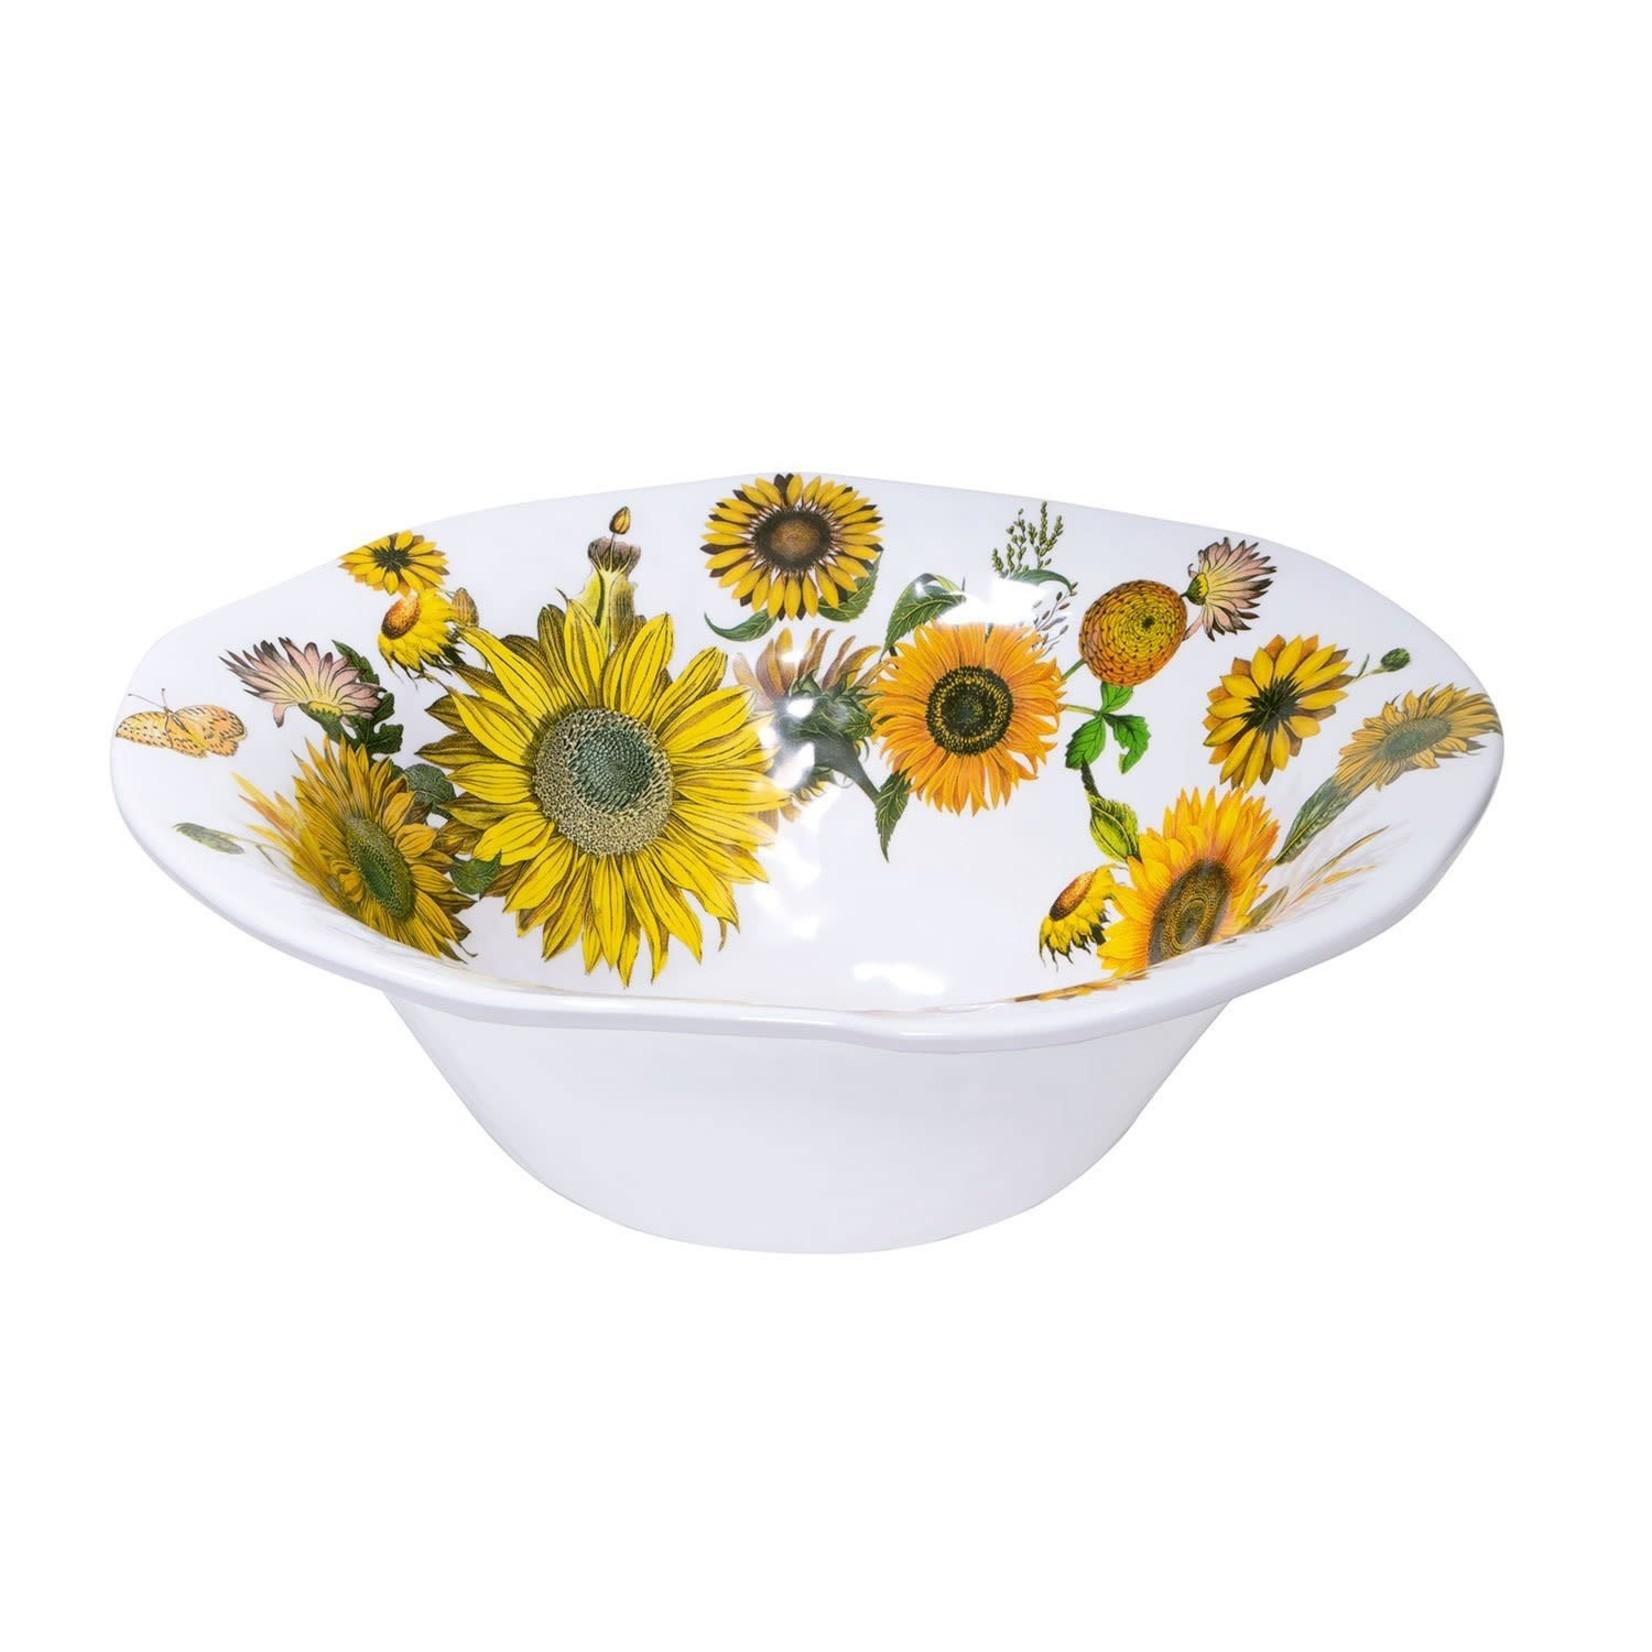 Michel Design Works Sunflower Melamine Large Bowl